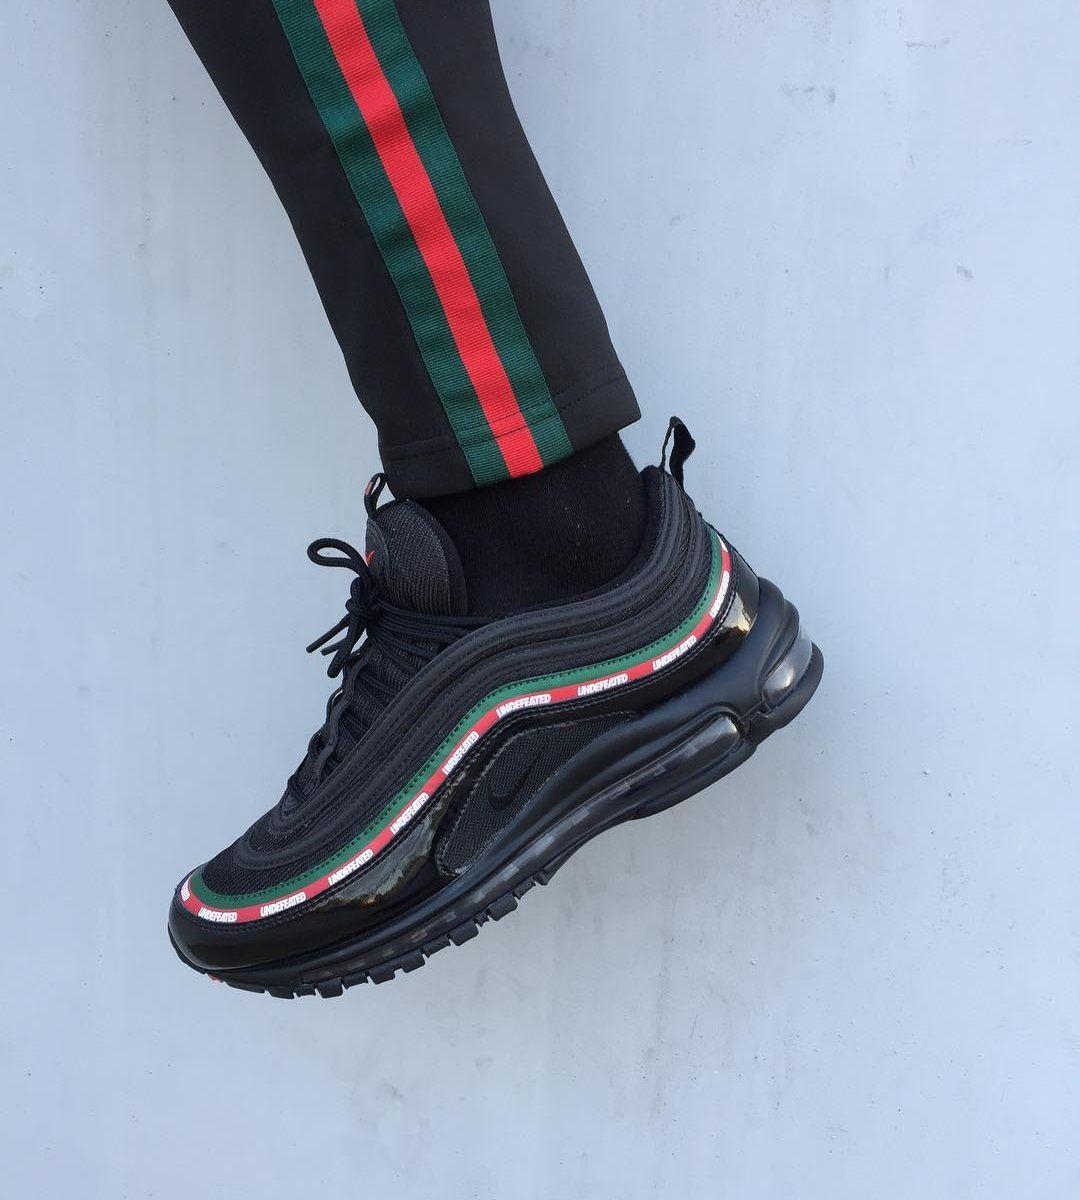 Undefeated Air Max 97 Follow Illumilondon For More Streetwear Collections Illumilondon Schuhe H S